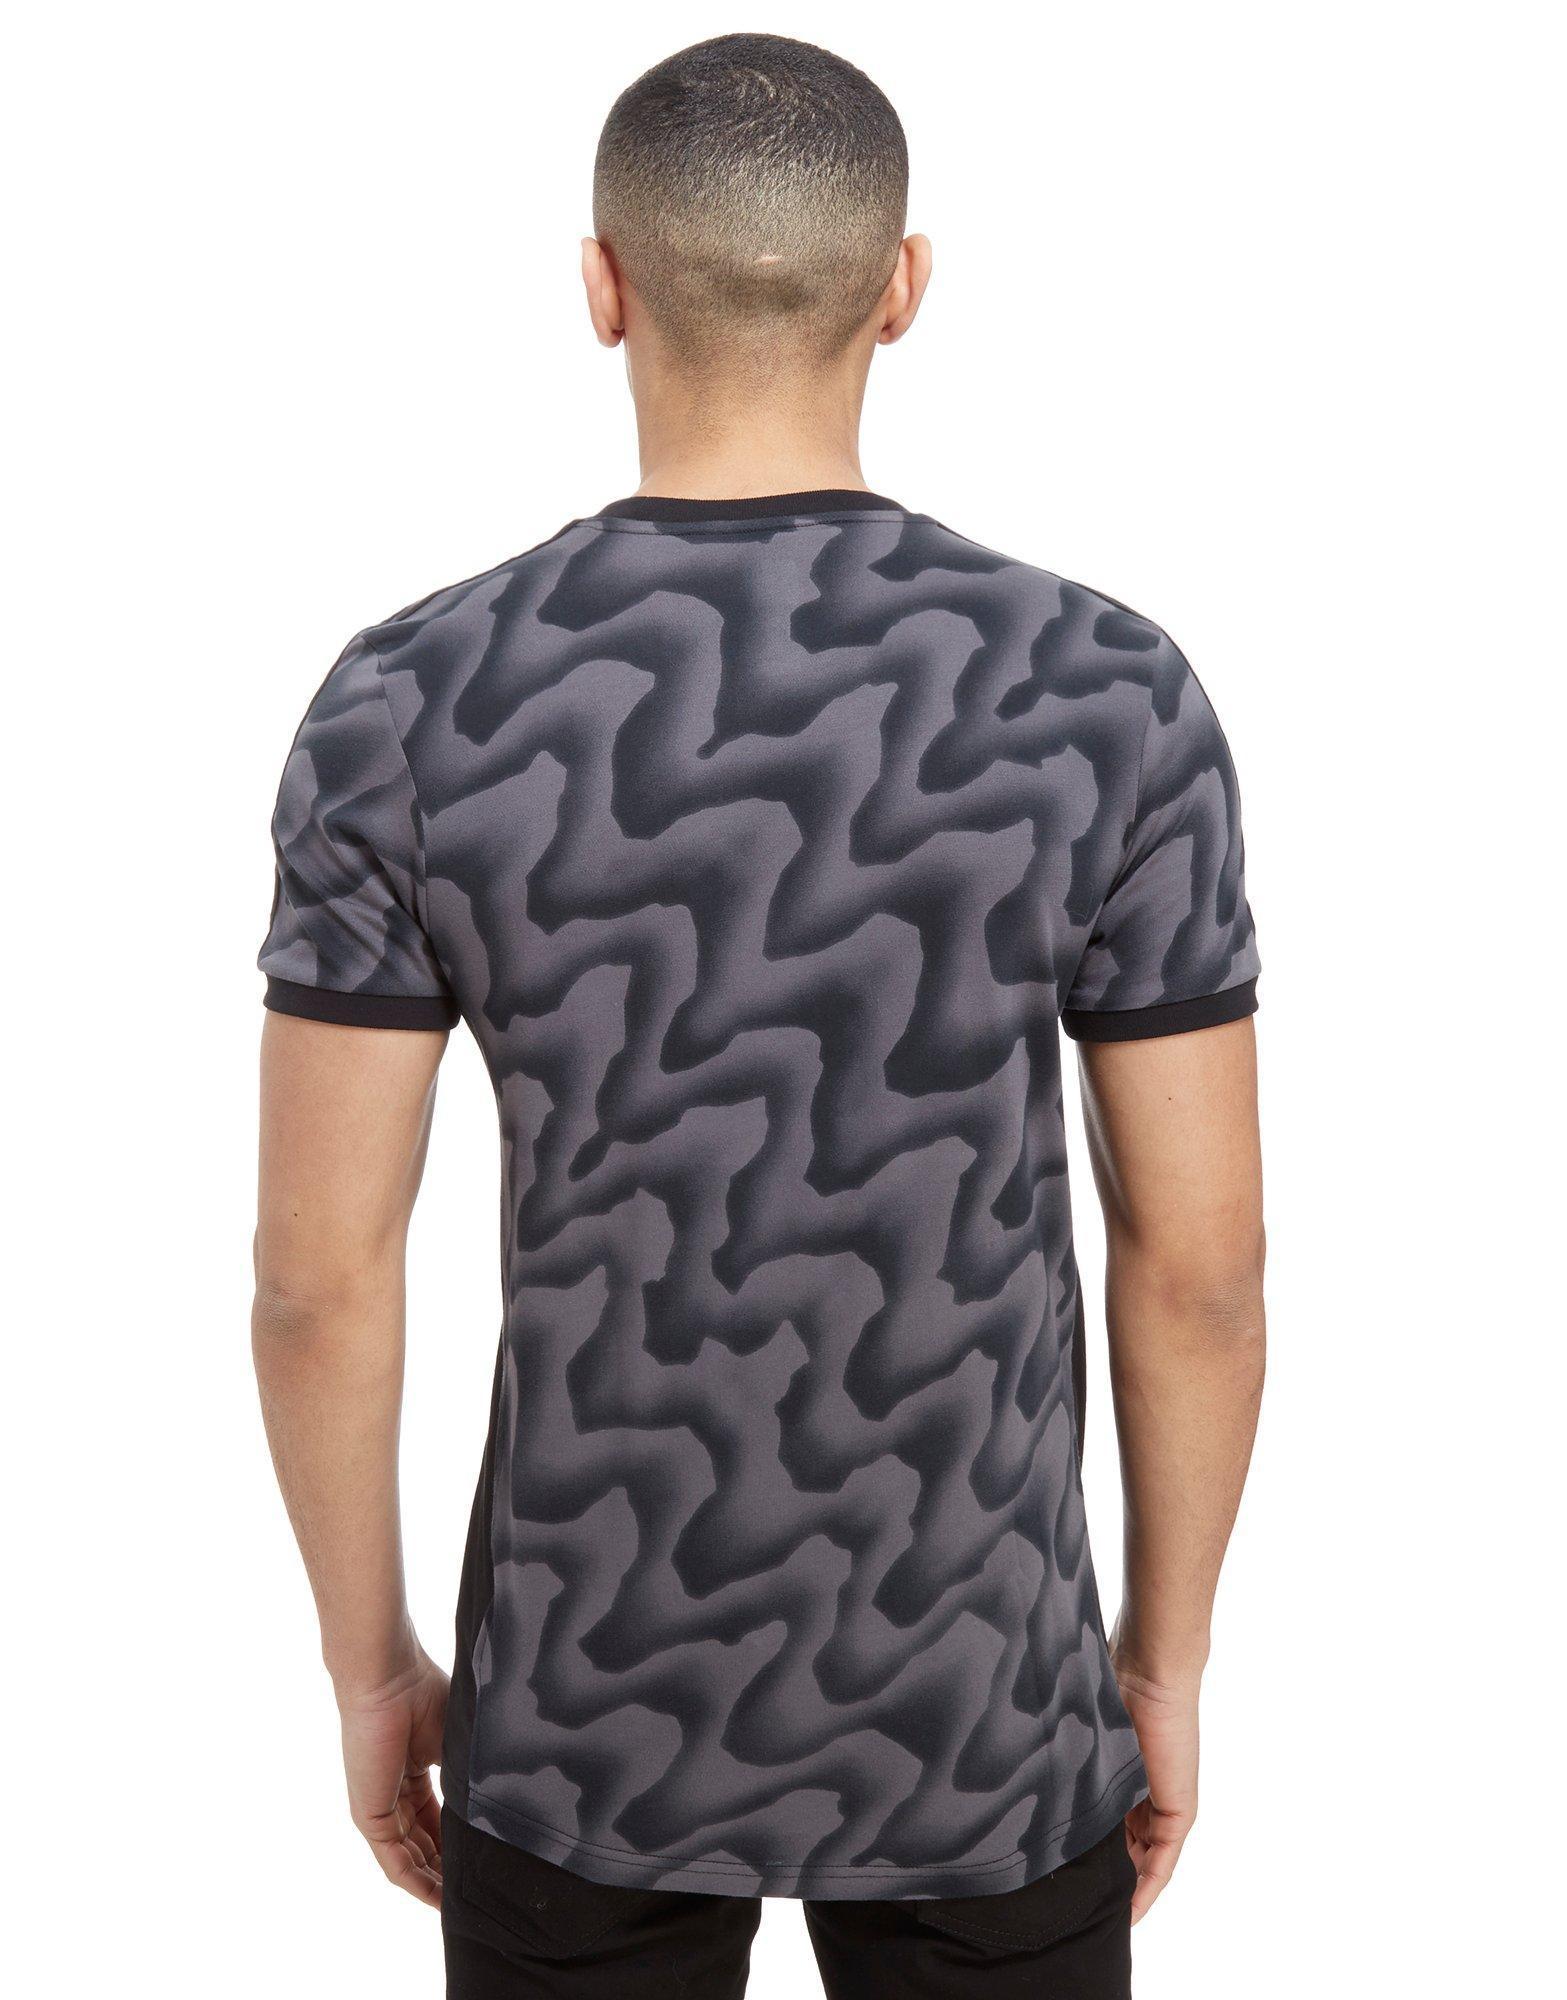 705c5f0922 Lyst - adidas Originals Skateboarding Warp Camo T-shirt in Gray for Men